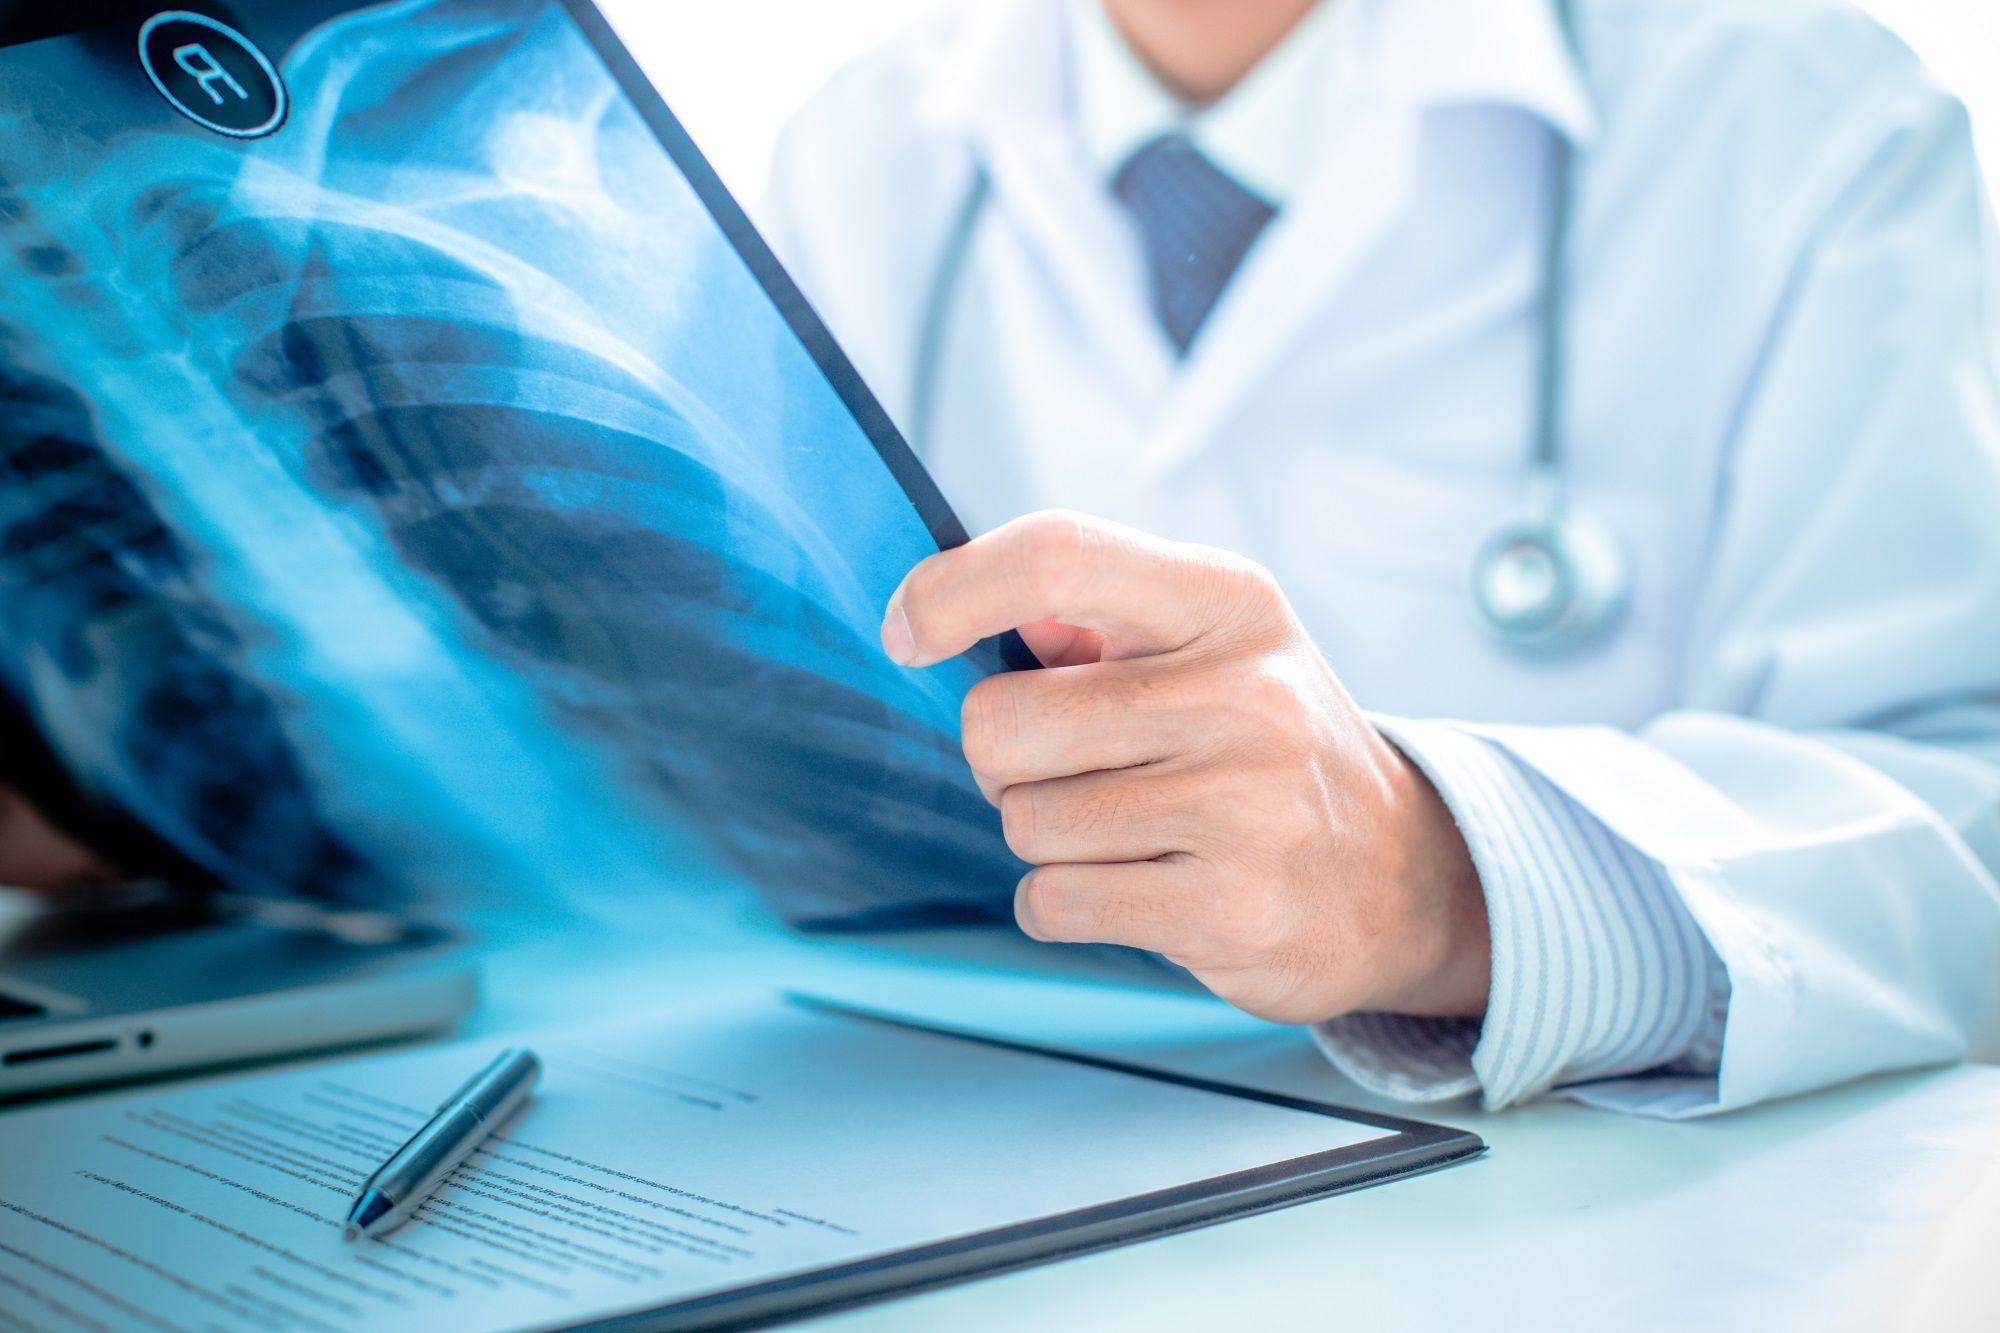 Asthme spécialiste - Consultation asthme - Doctissimo 6d8719a6c8d1